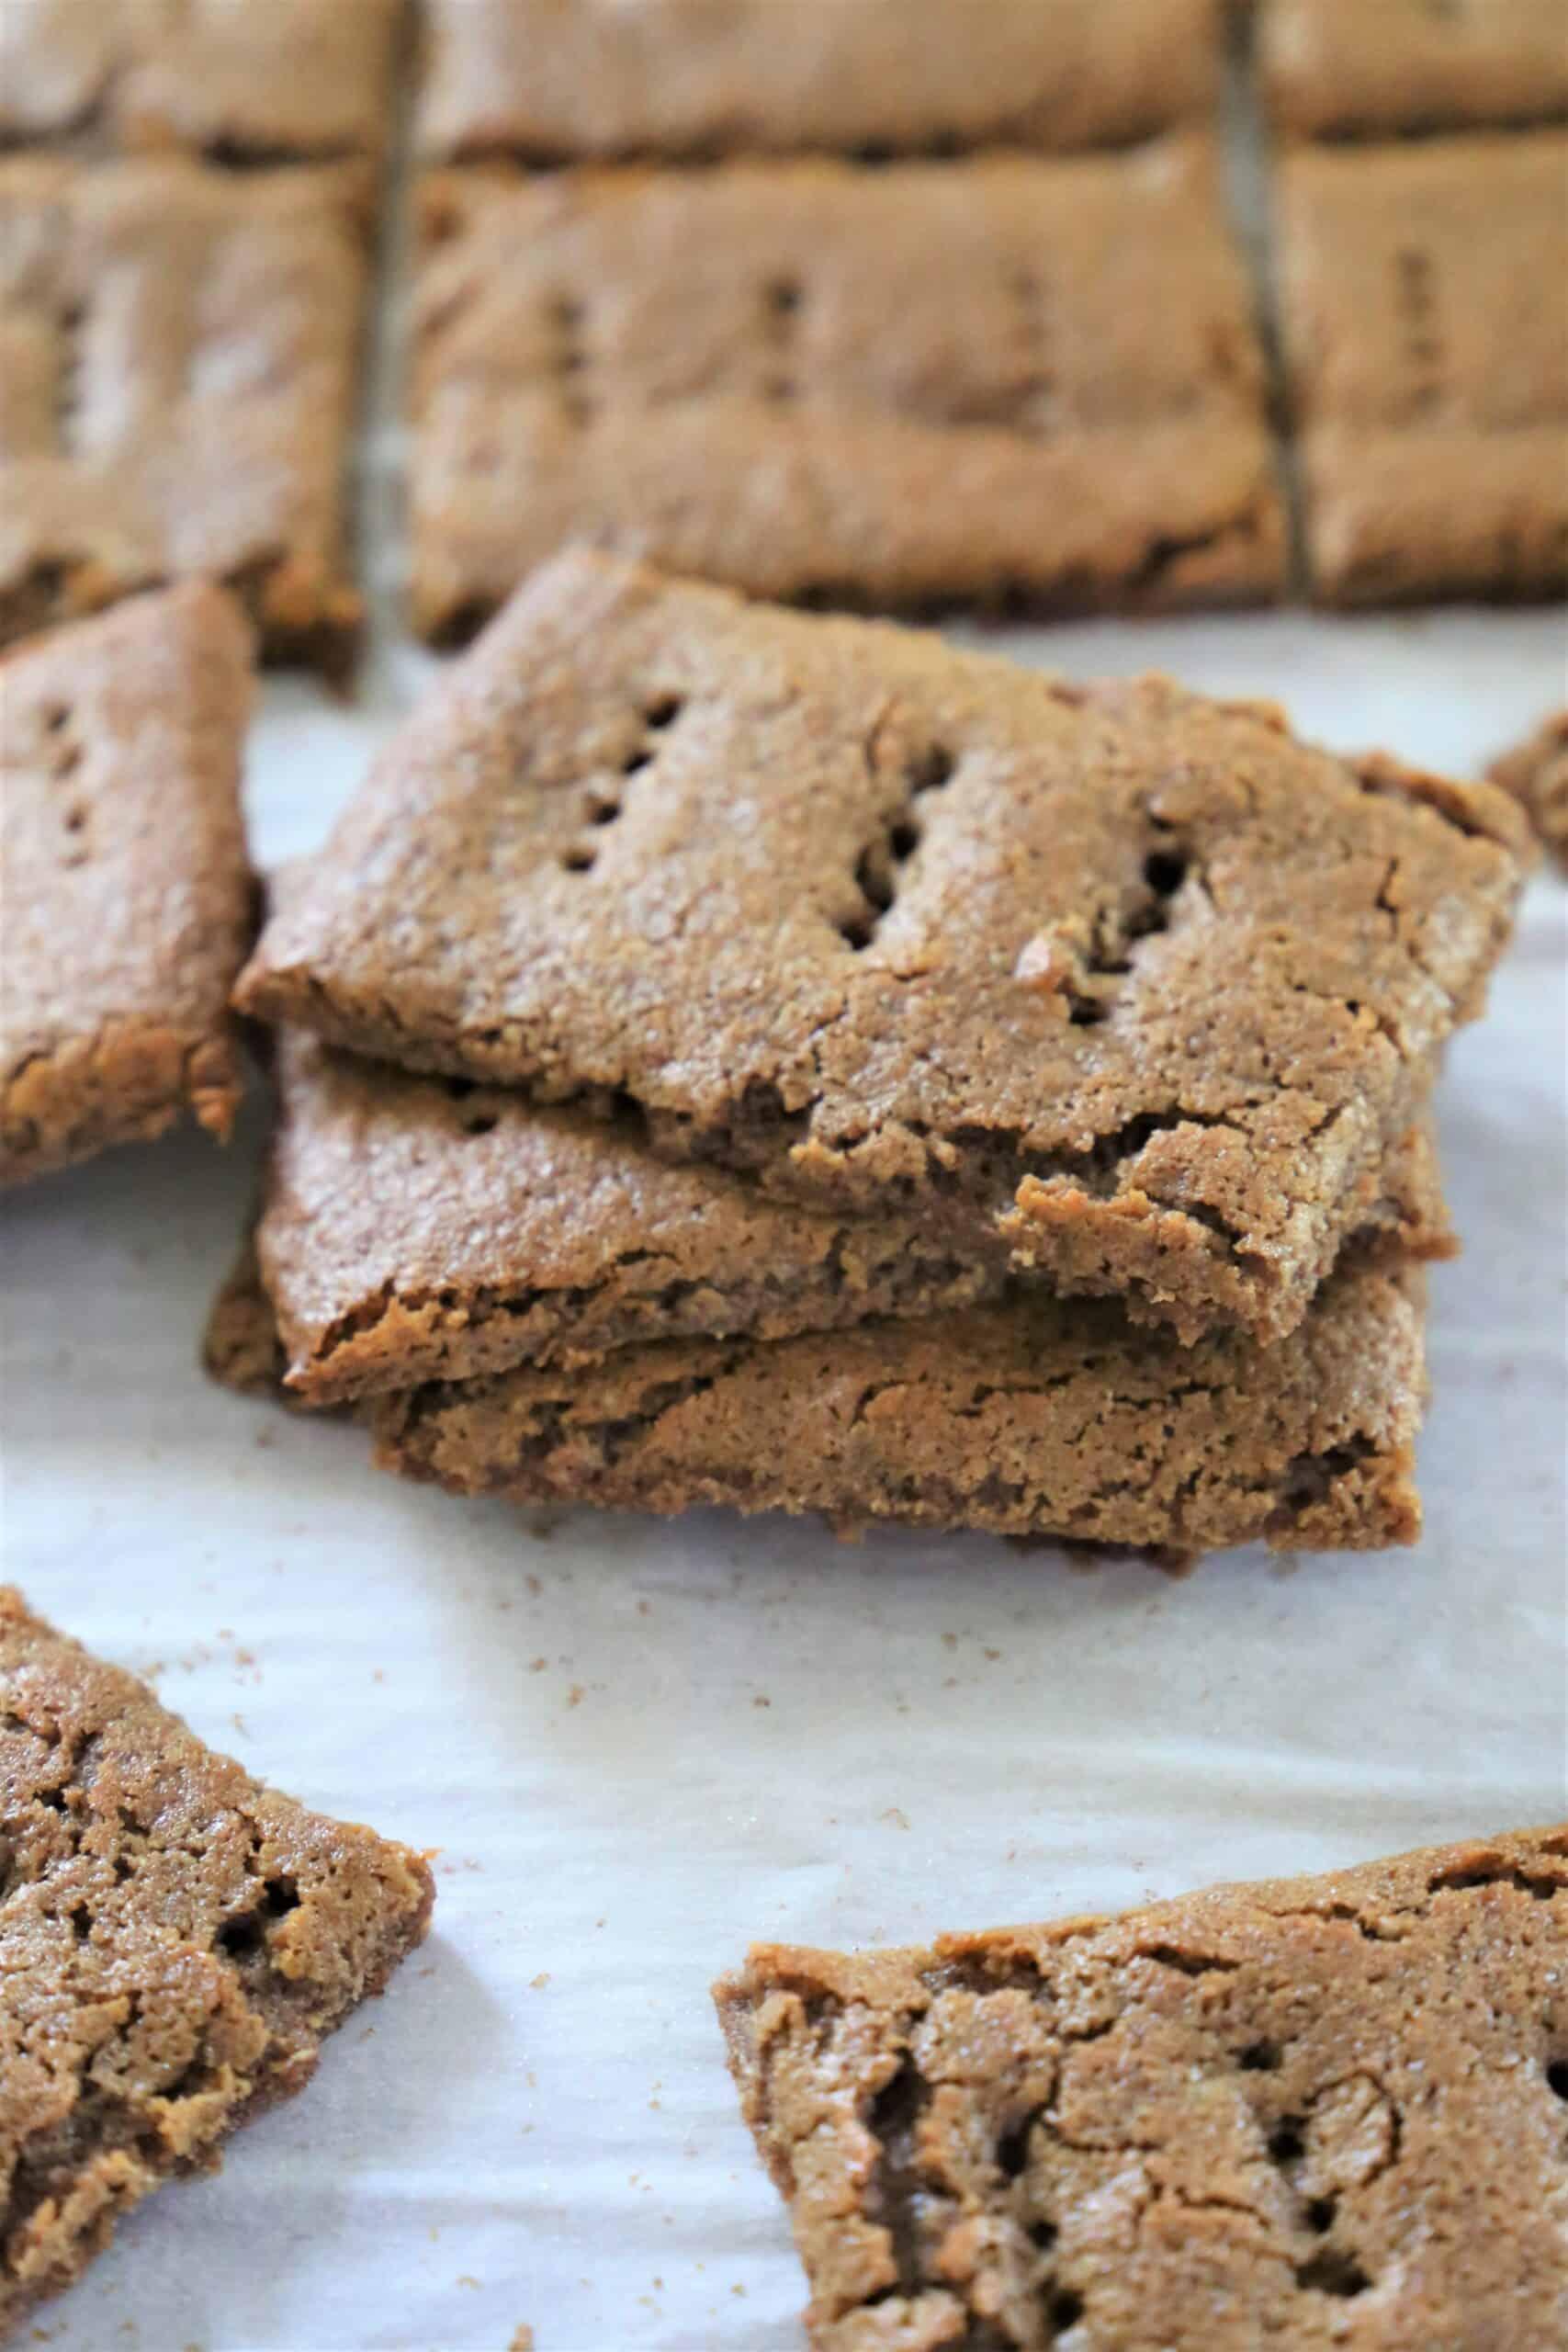 batch of graham crackers on baking sheet